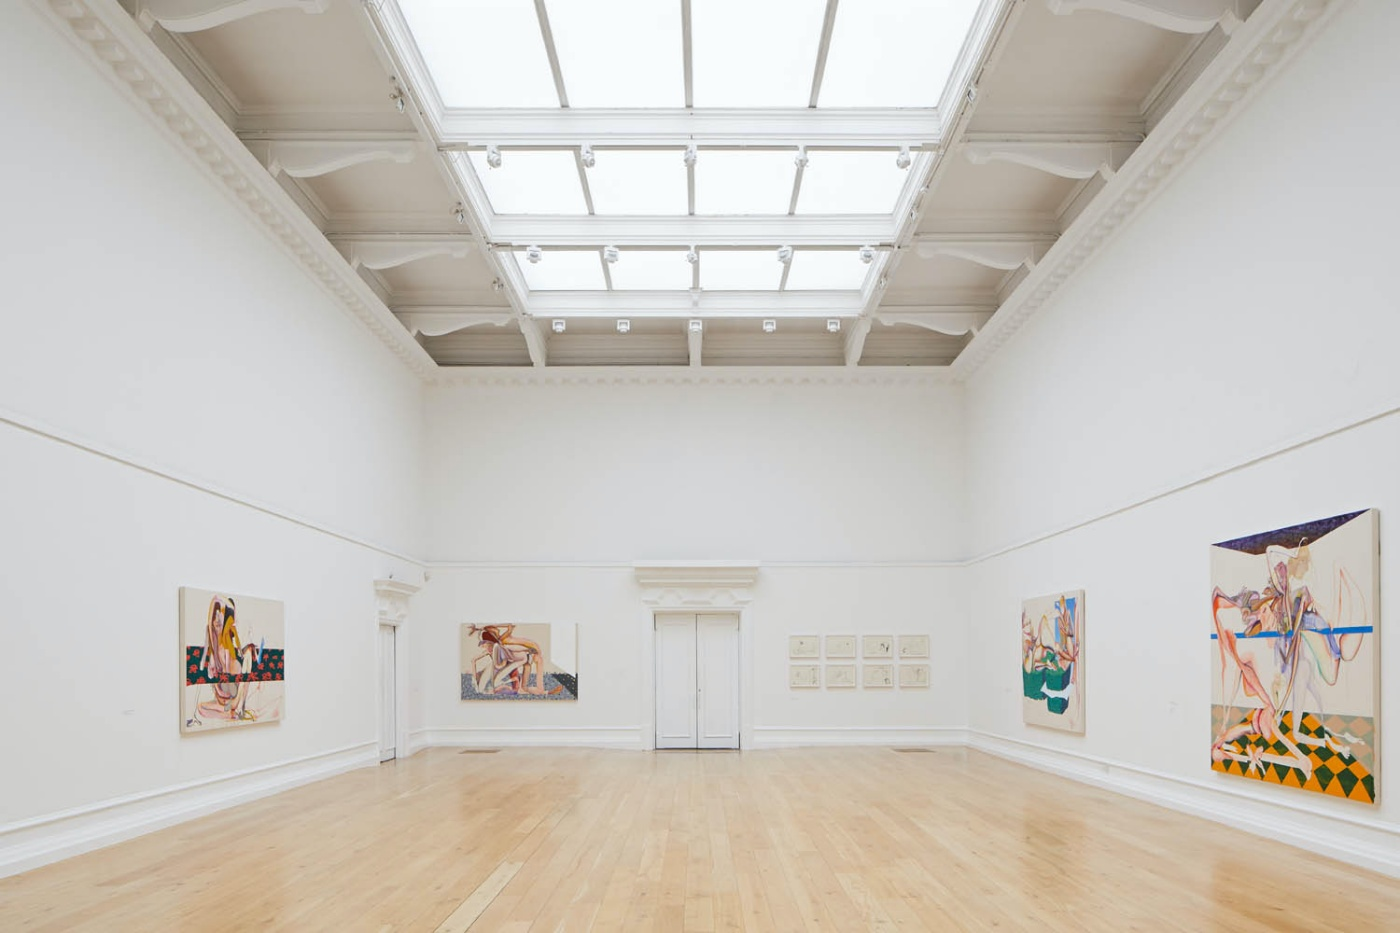 South London Gallery Christina Quarles 2